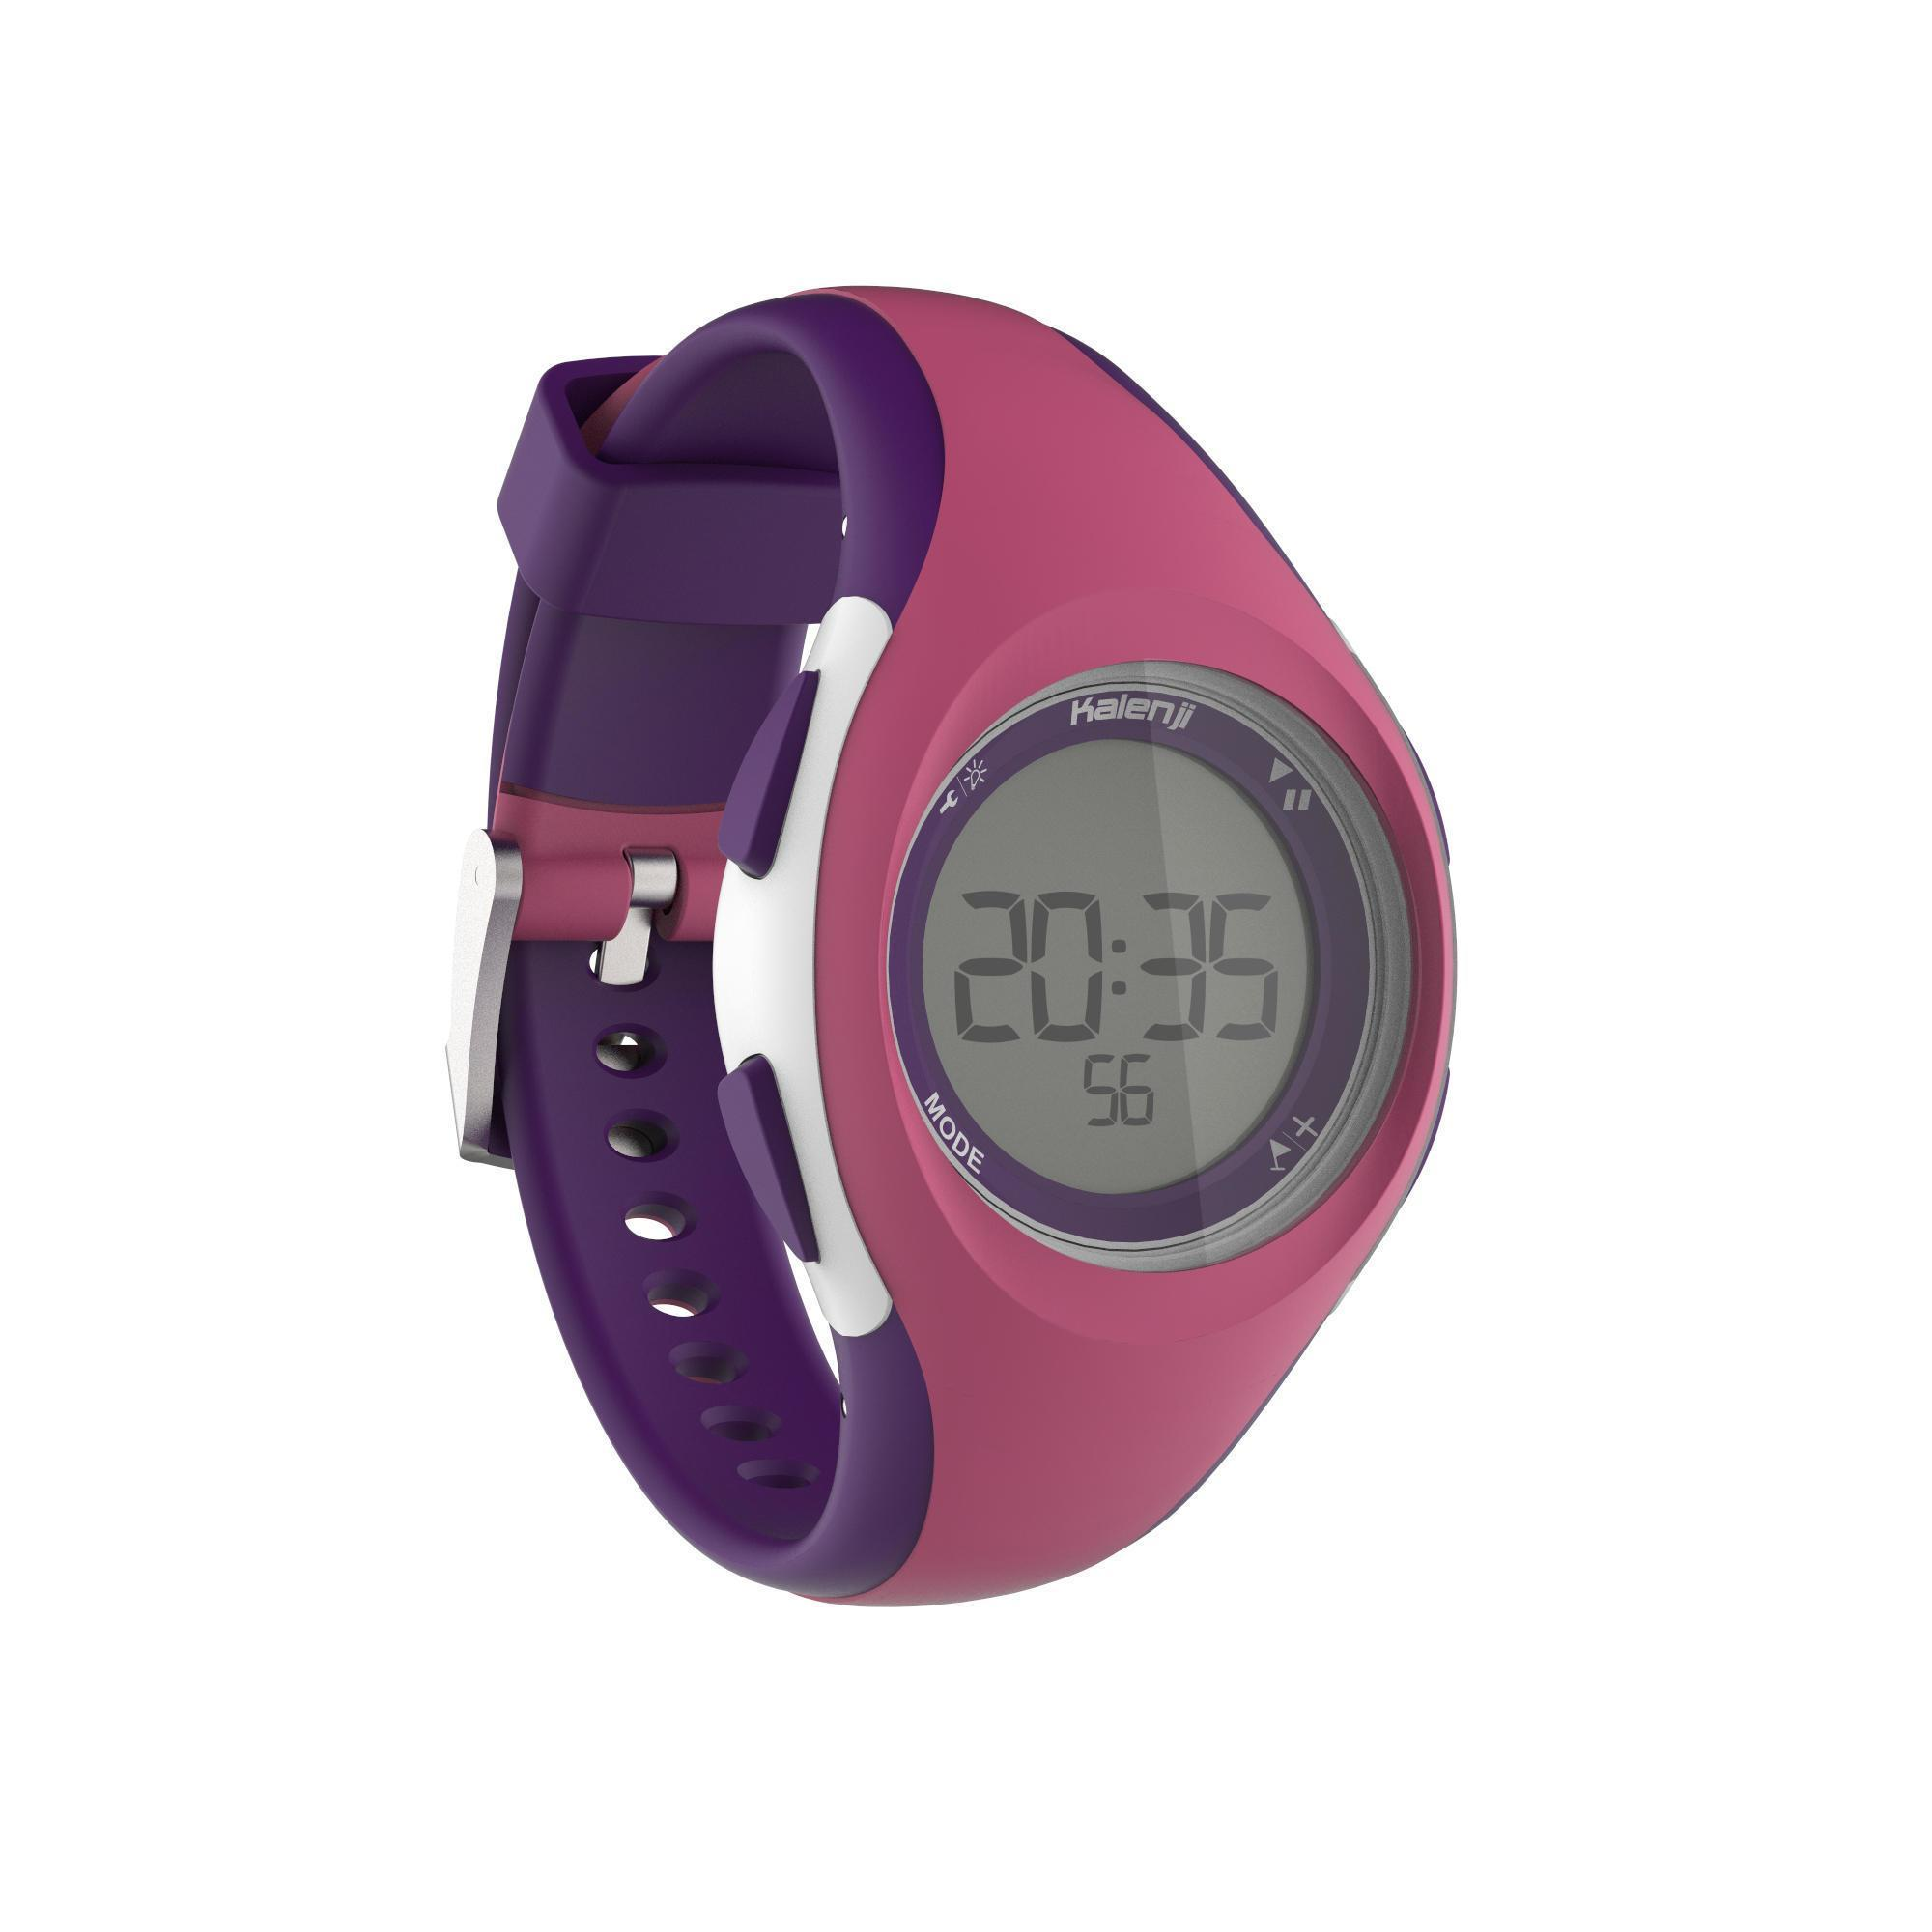 ac0b89bc929 Elektronica kopen met korting. Kalenji – Sport accessoires – Horloge ...